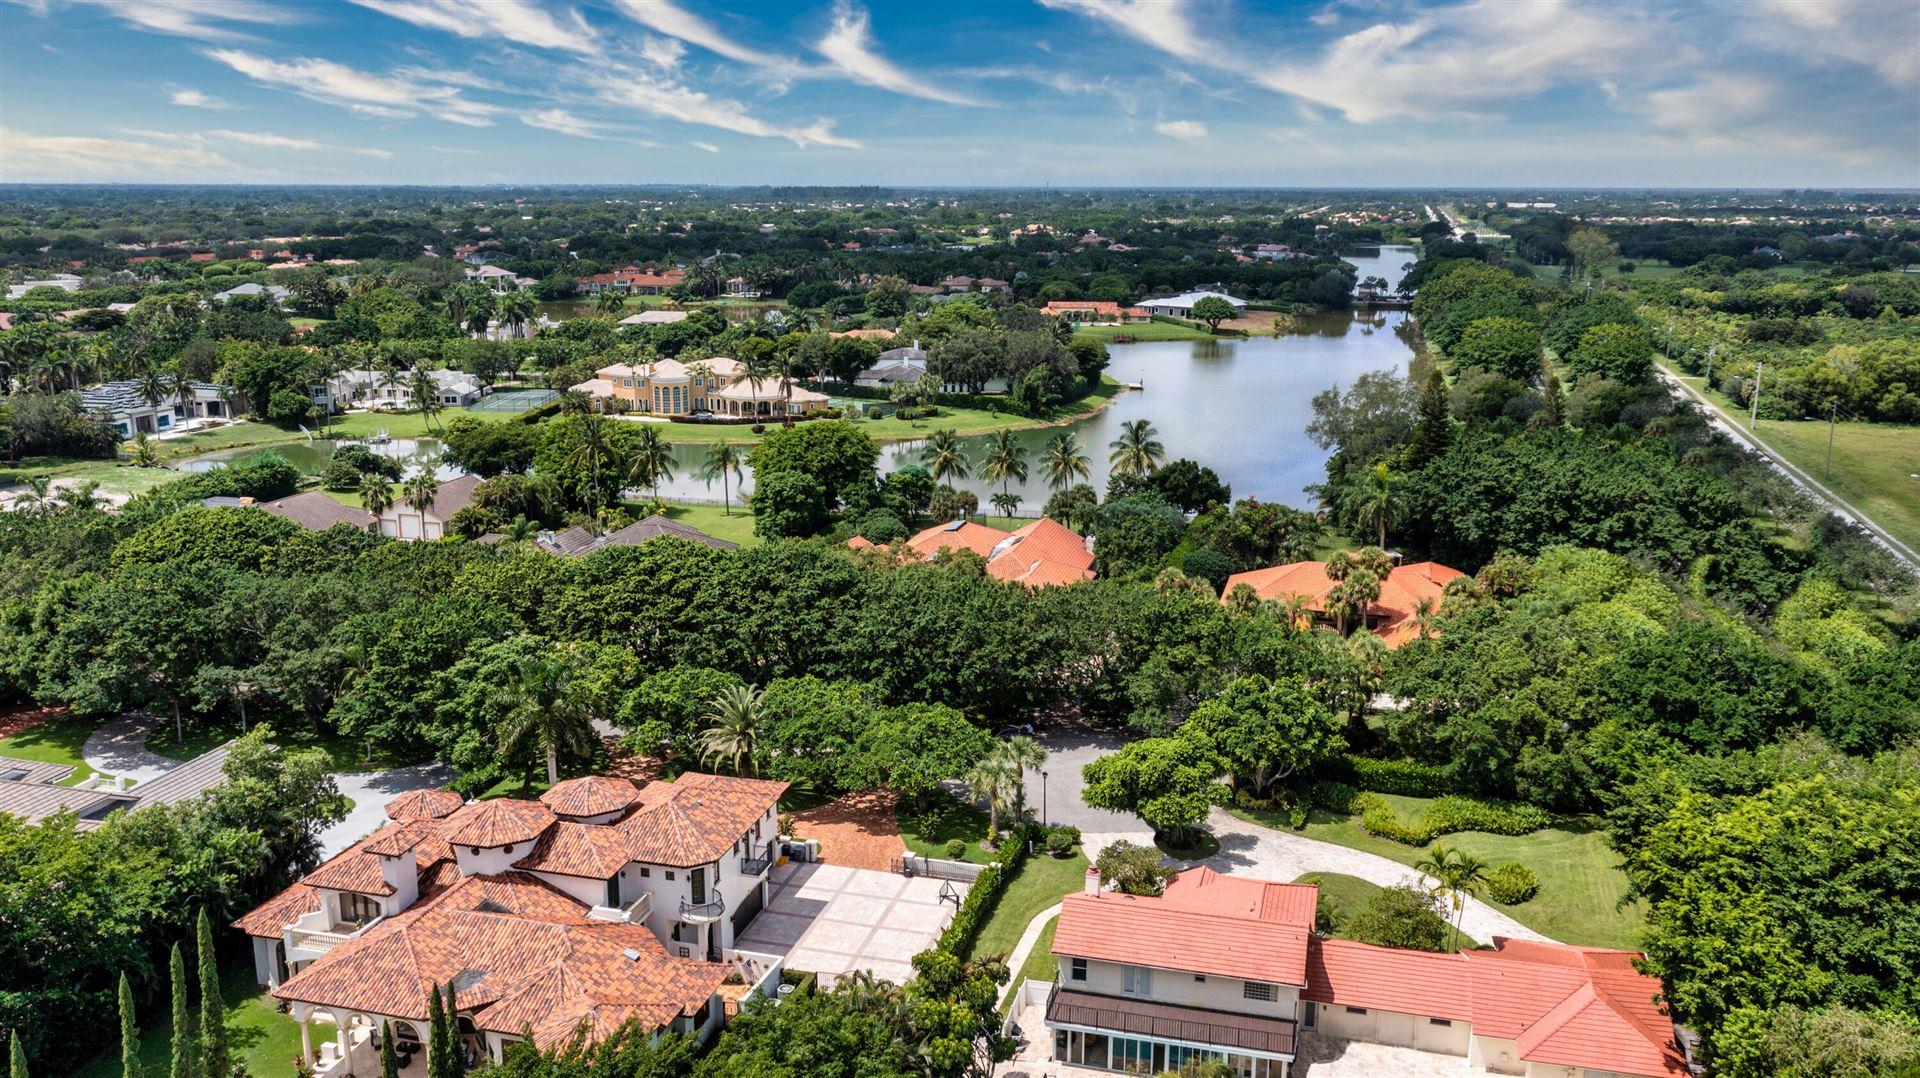 Photo of 8044 Twin Lake Drive, Boca Raton, FL 33496 (MLS # RX-10746281)